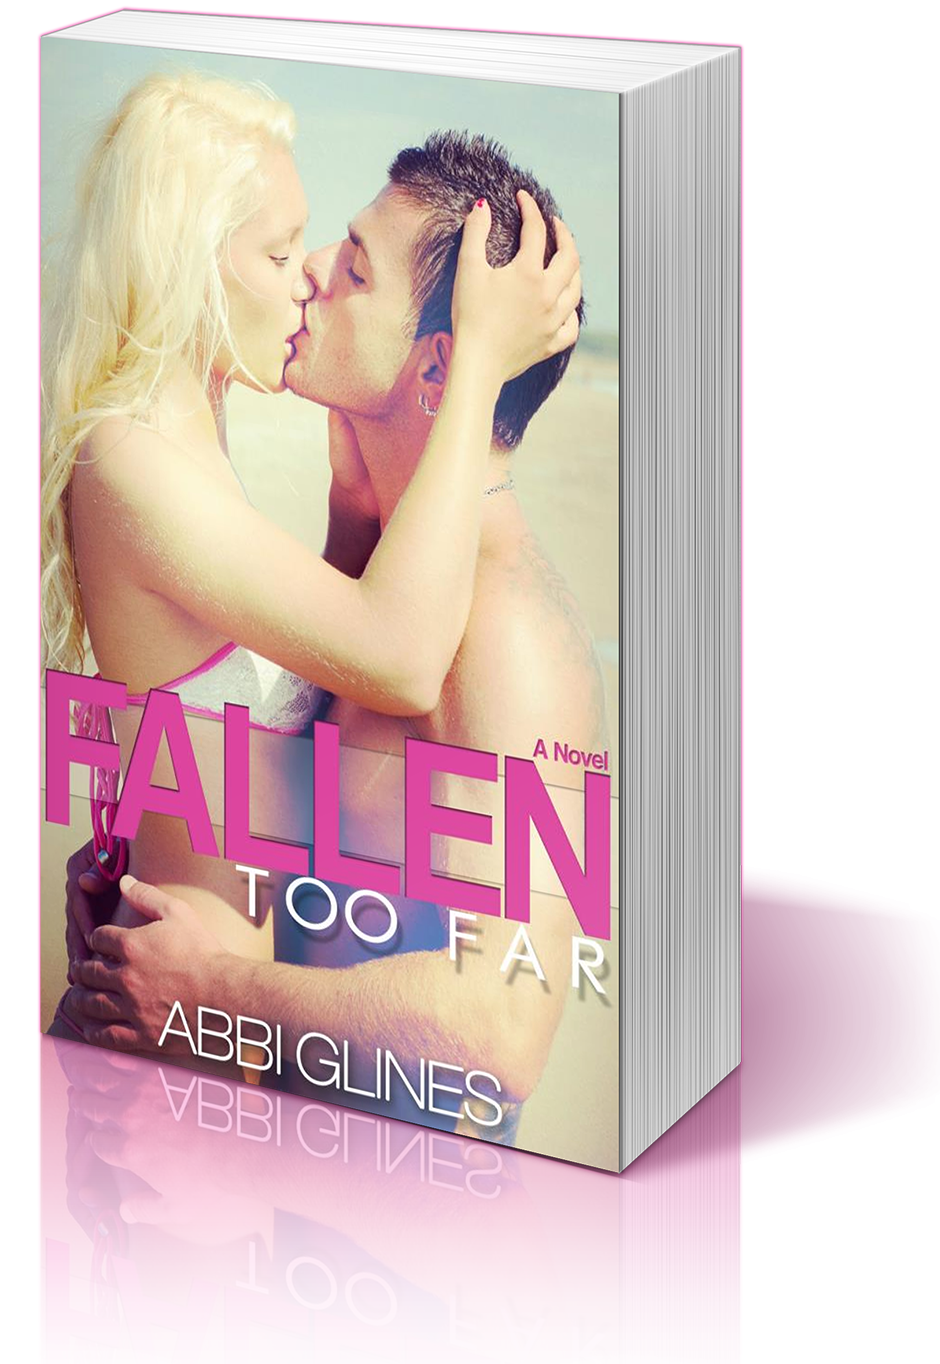 http://stefanie-g-books.blogspot.cz/2014/02/abbi-glines-too-far-1-fallen-too-far.html